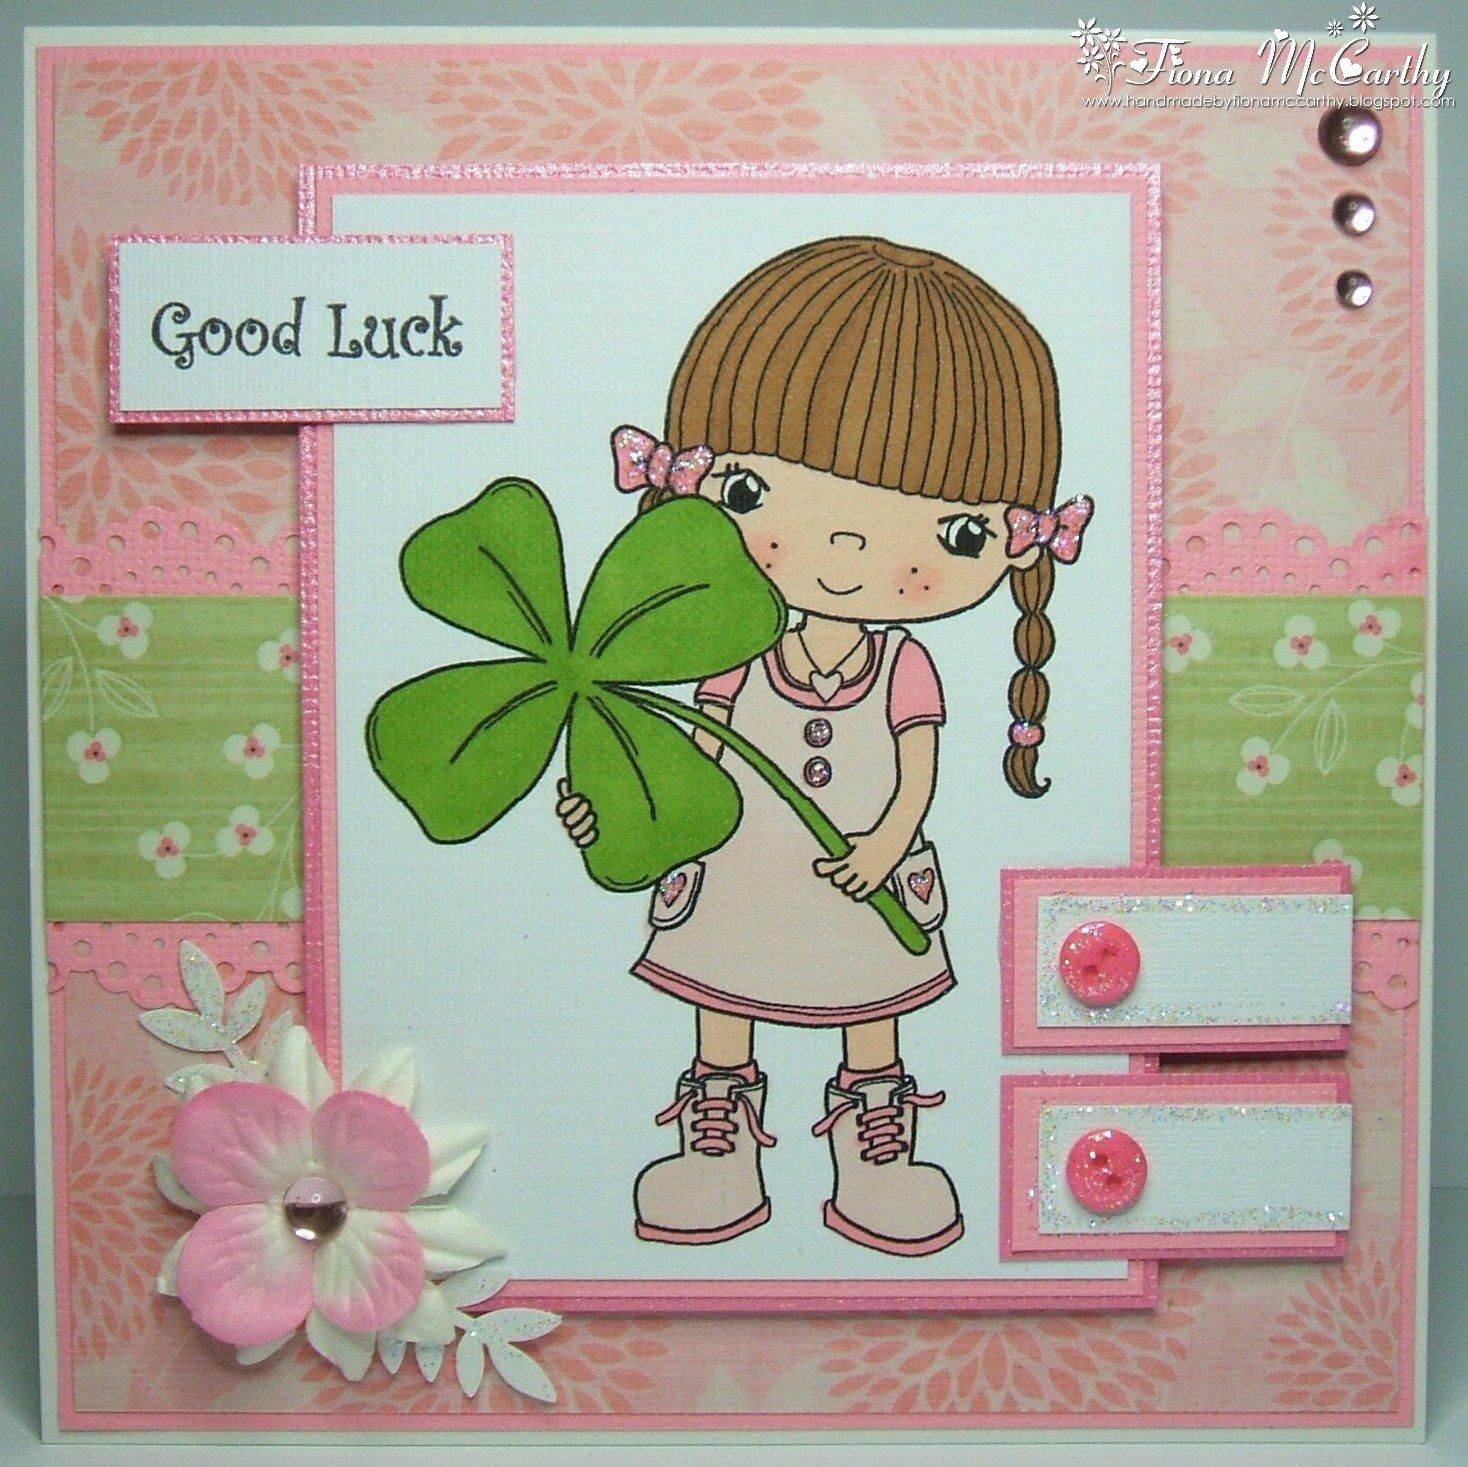 Good Luck Card Template Beautiful Good Luck Cards to Print Portablegasgrillweber